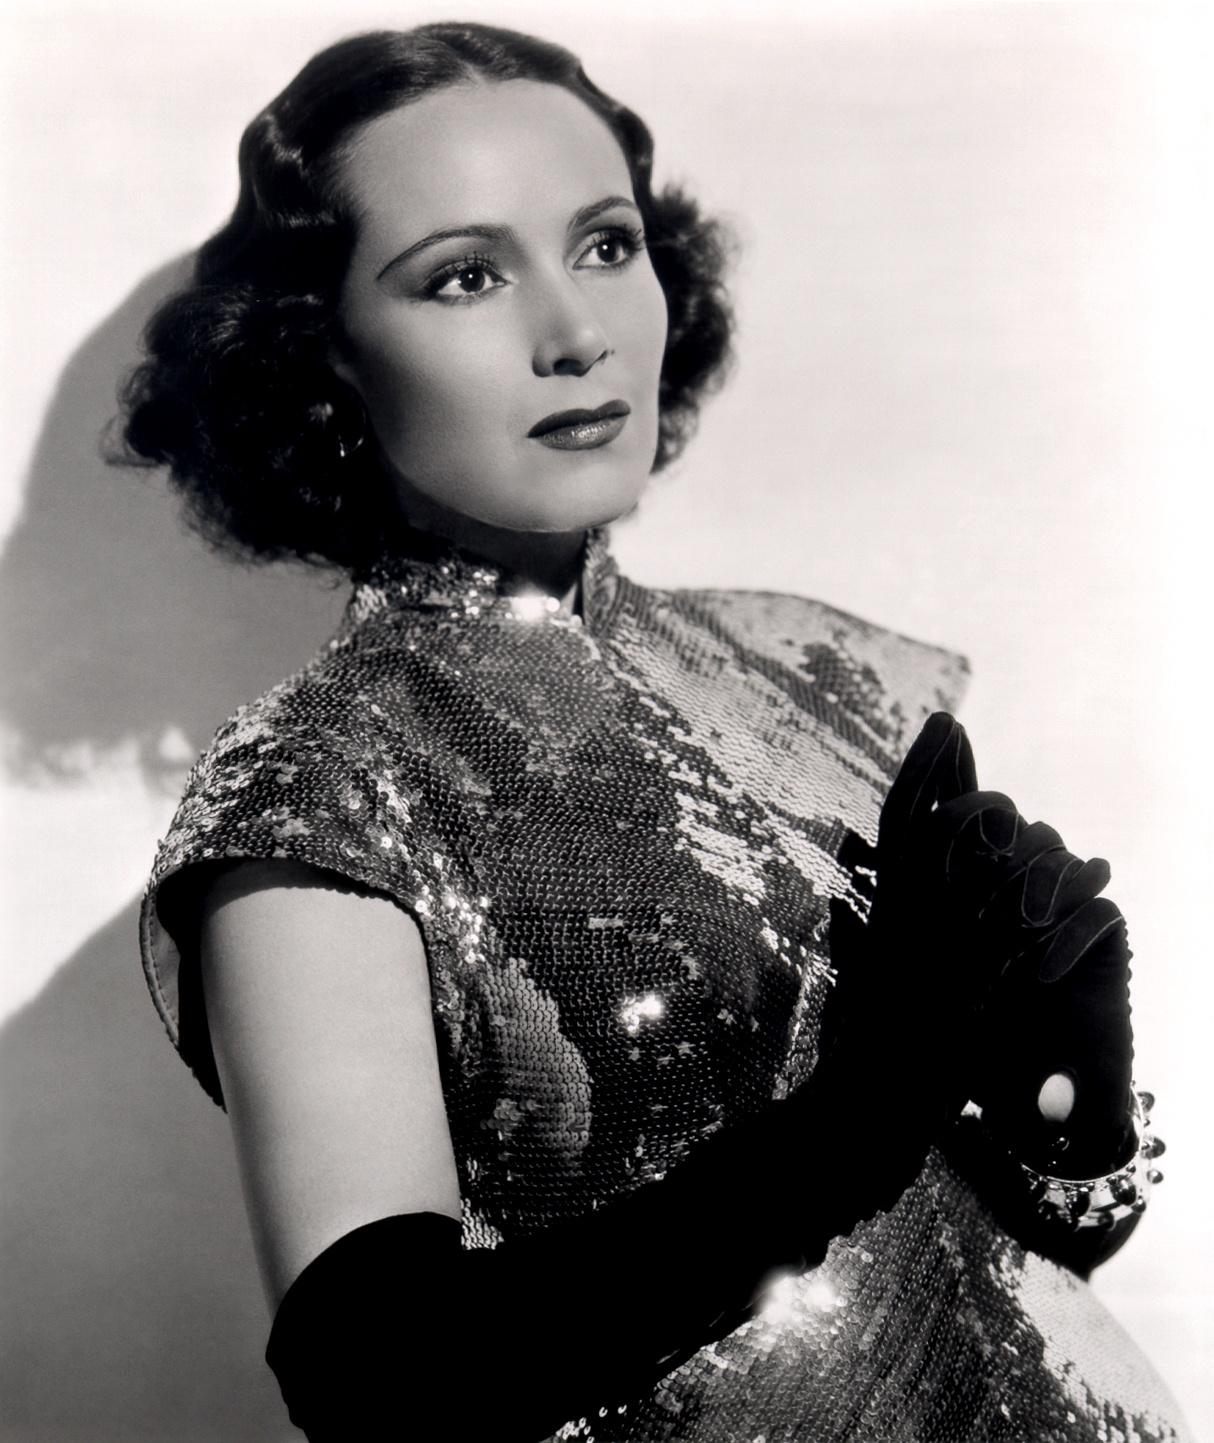 Dolores Del Rio - Images